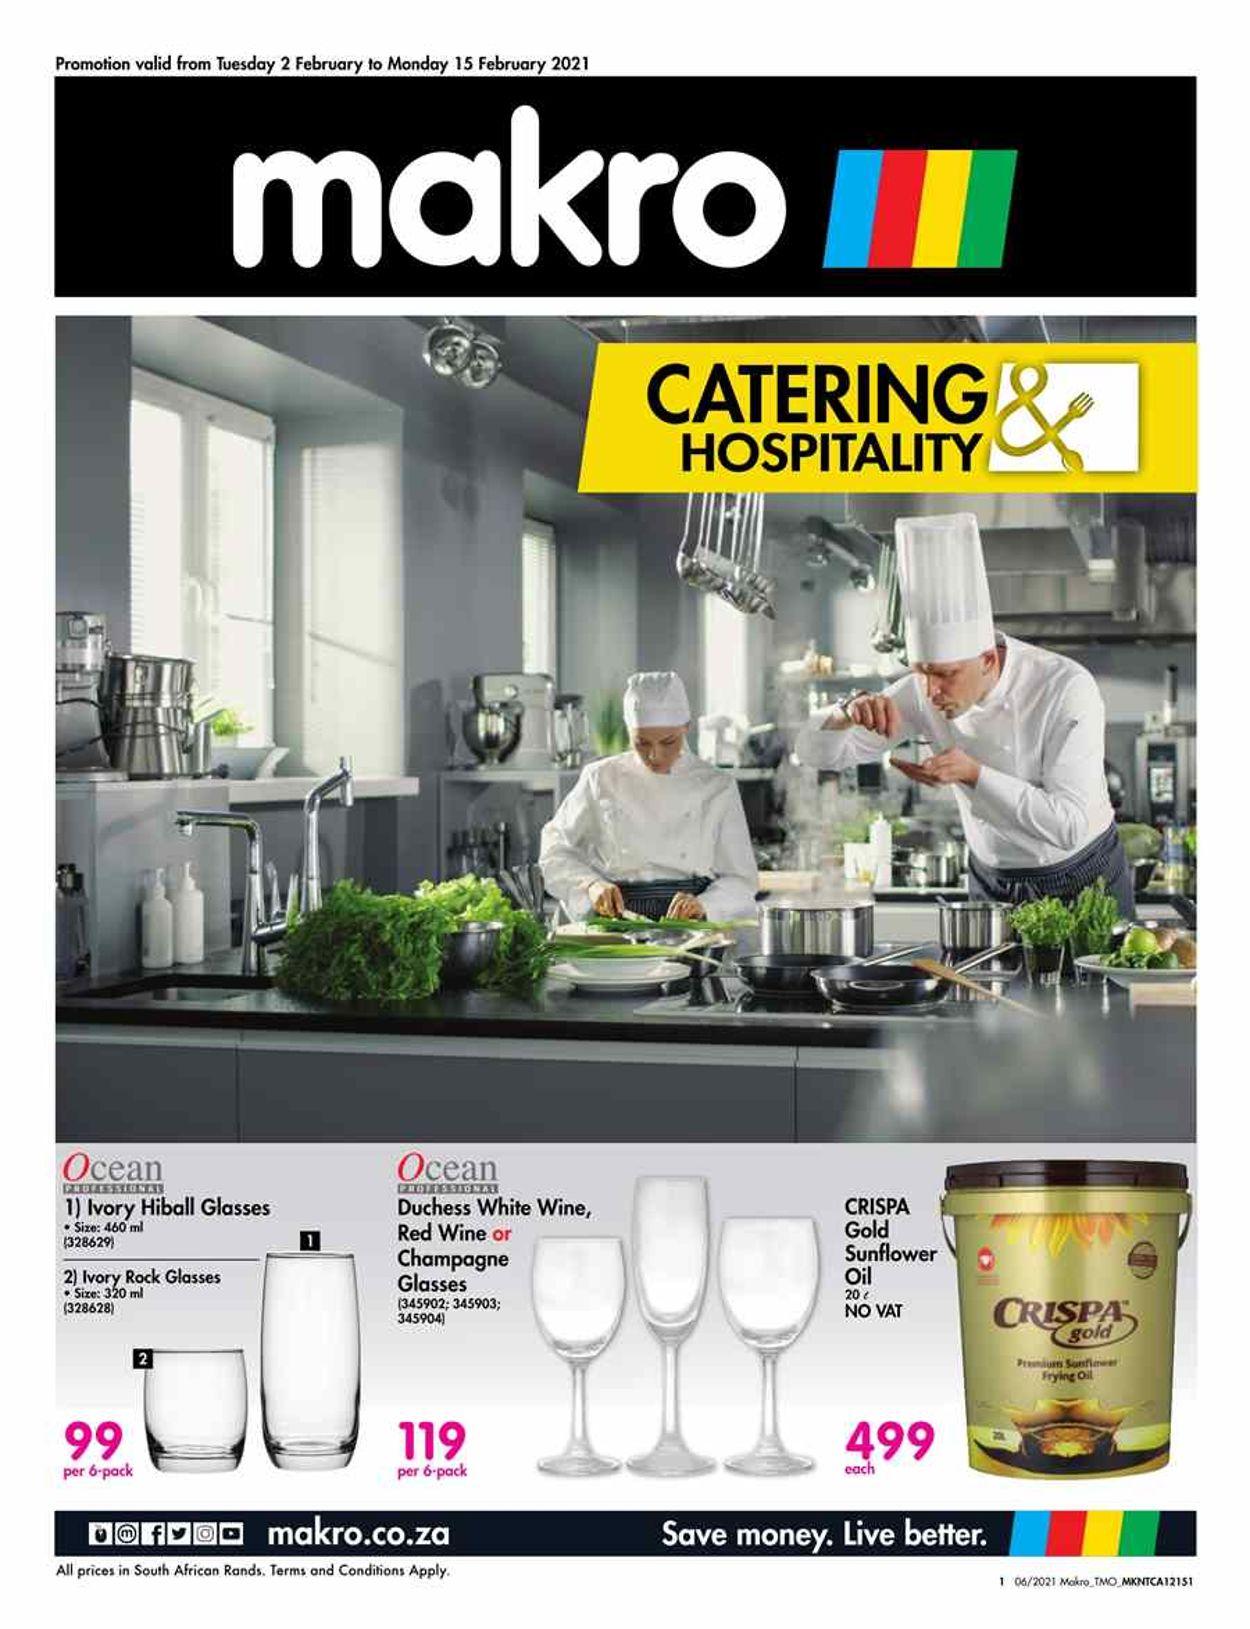 Makro Catalogue - 2021/02/02-2021/02/15